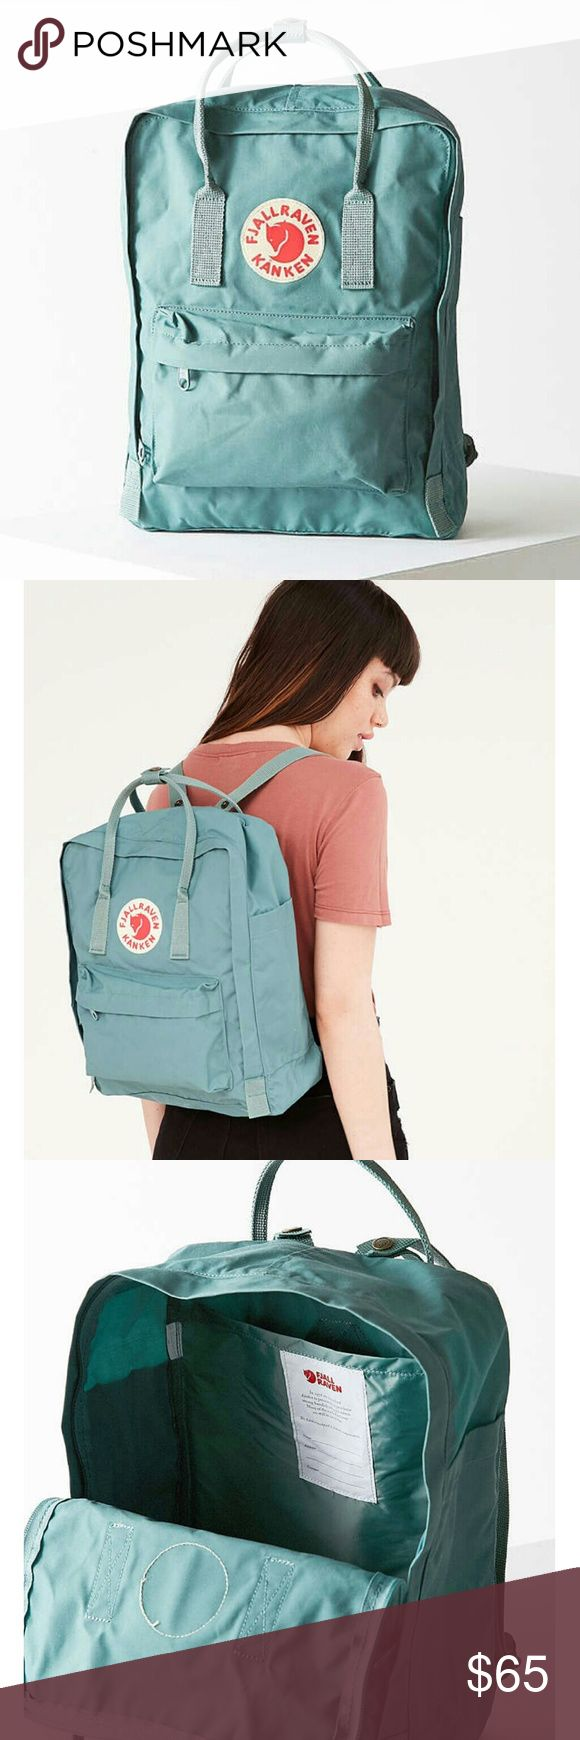 15 Best Great Products Images On Pinterest Product Design Antique Fjallraven Kanken Laptop 15ampquot Royal Blue Backpack In Frost Green